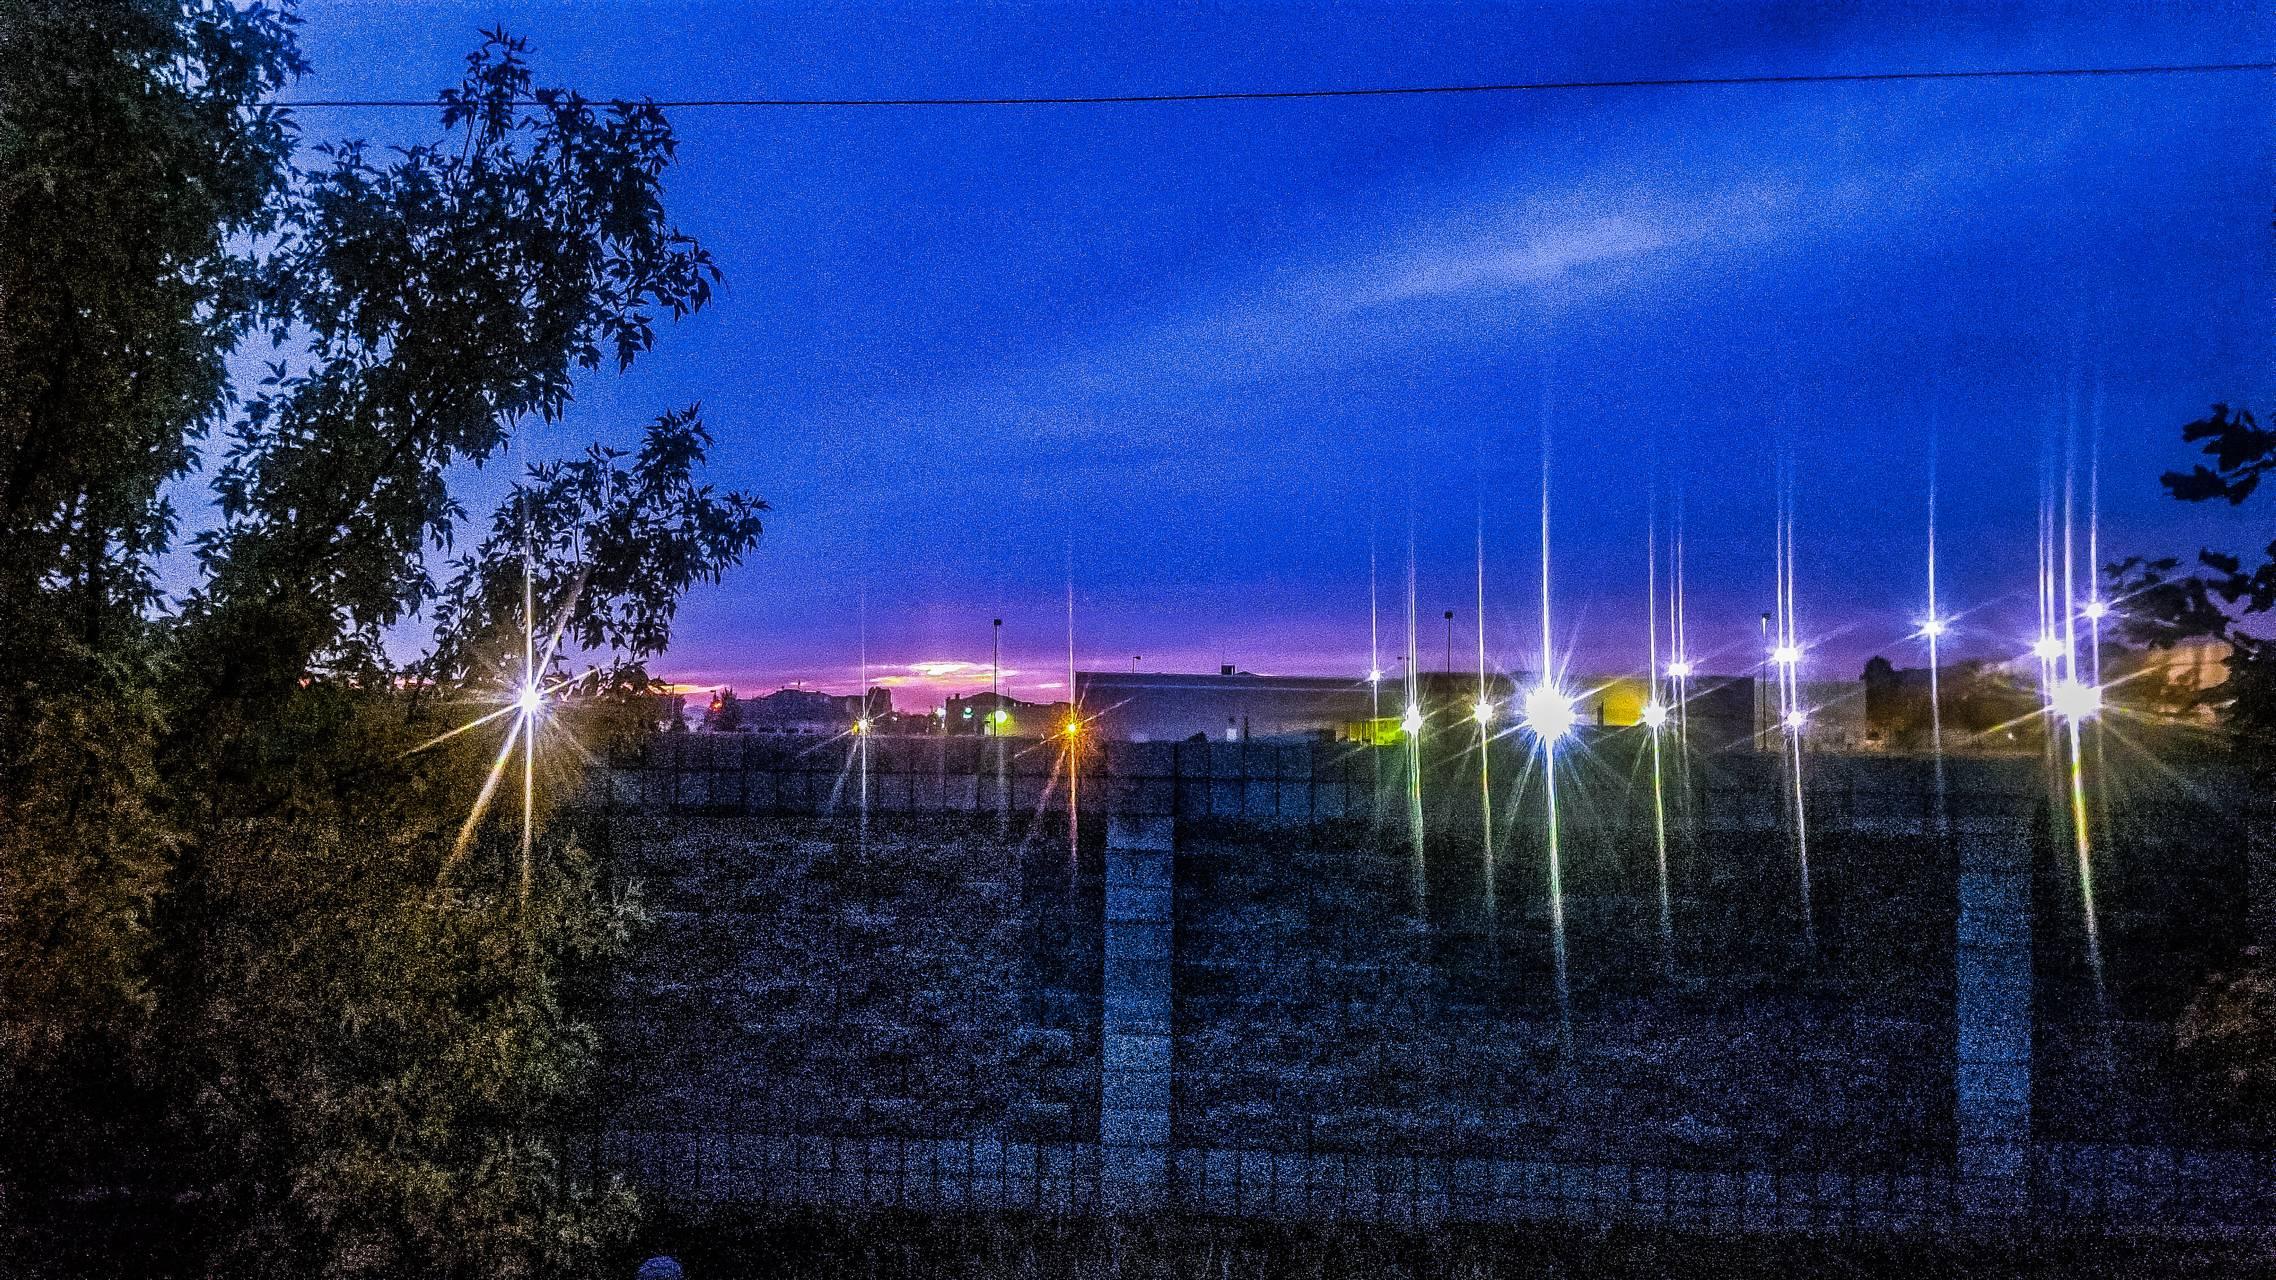 Night wall